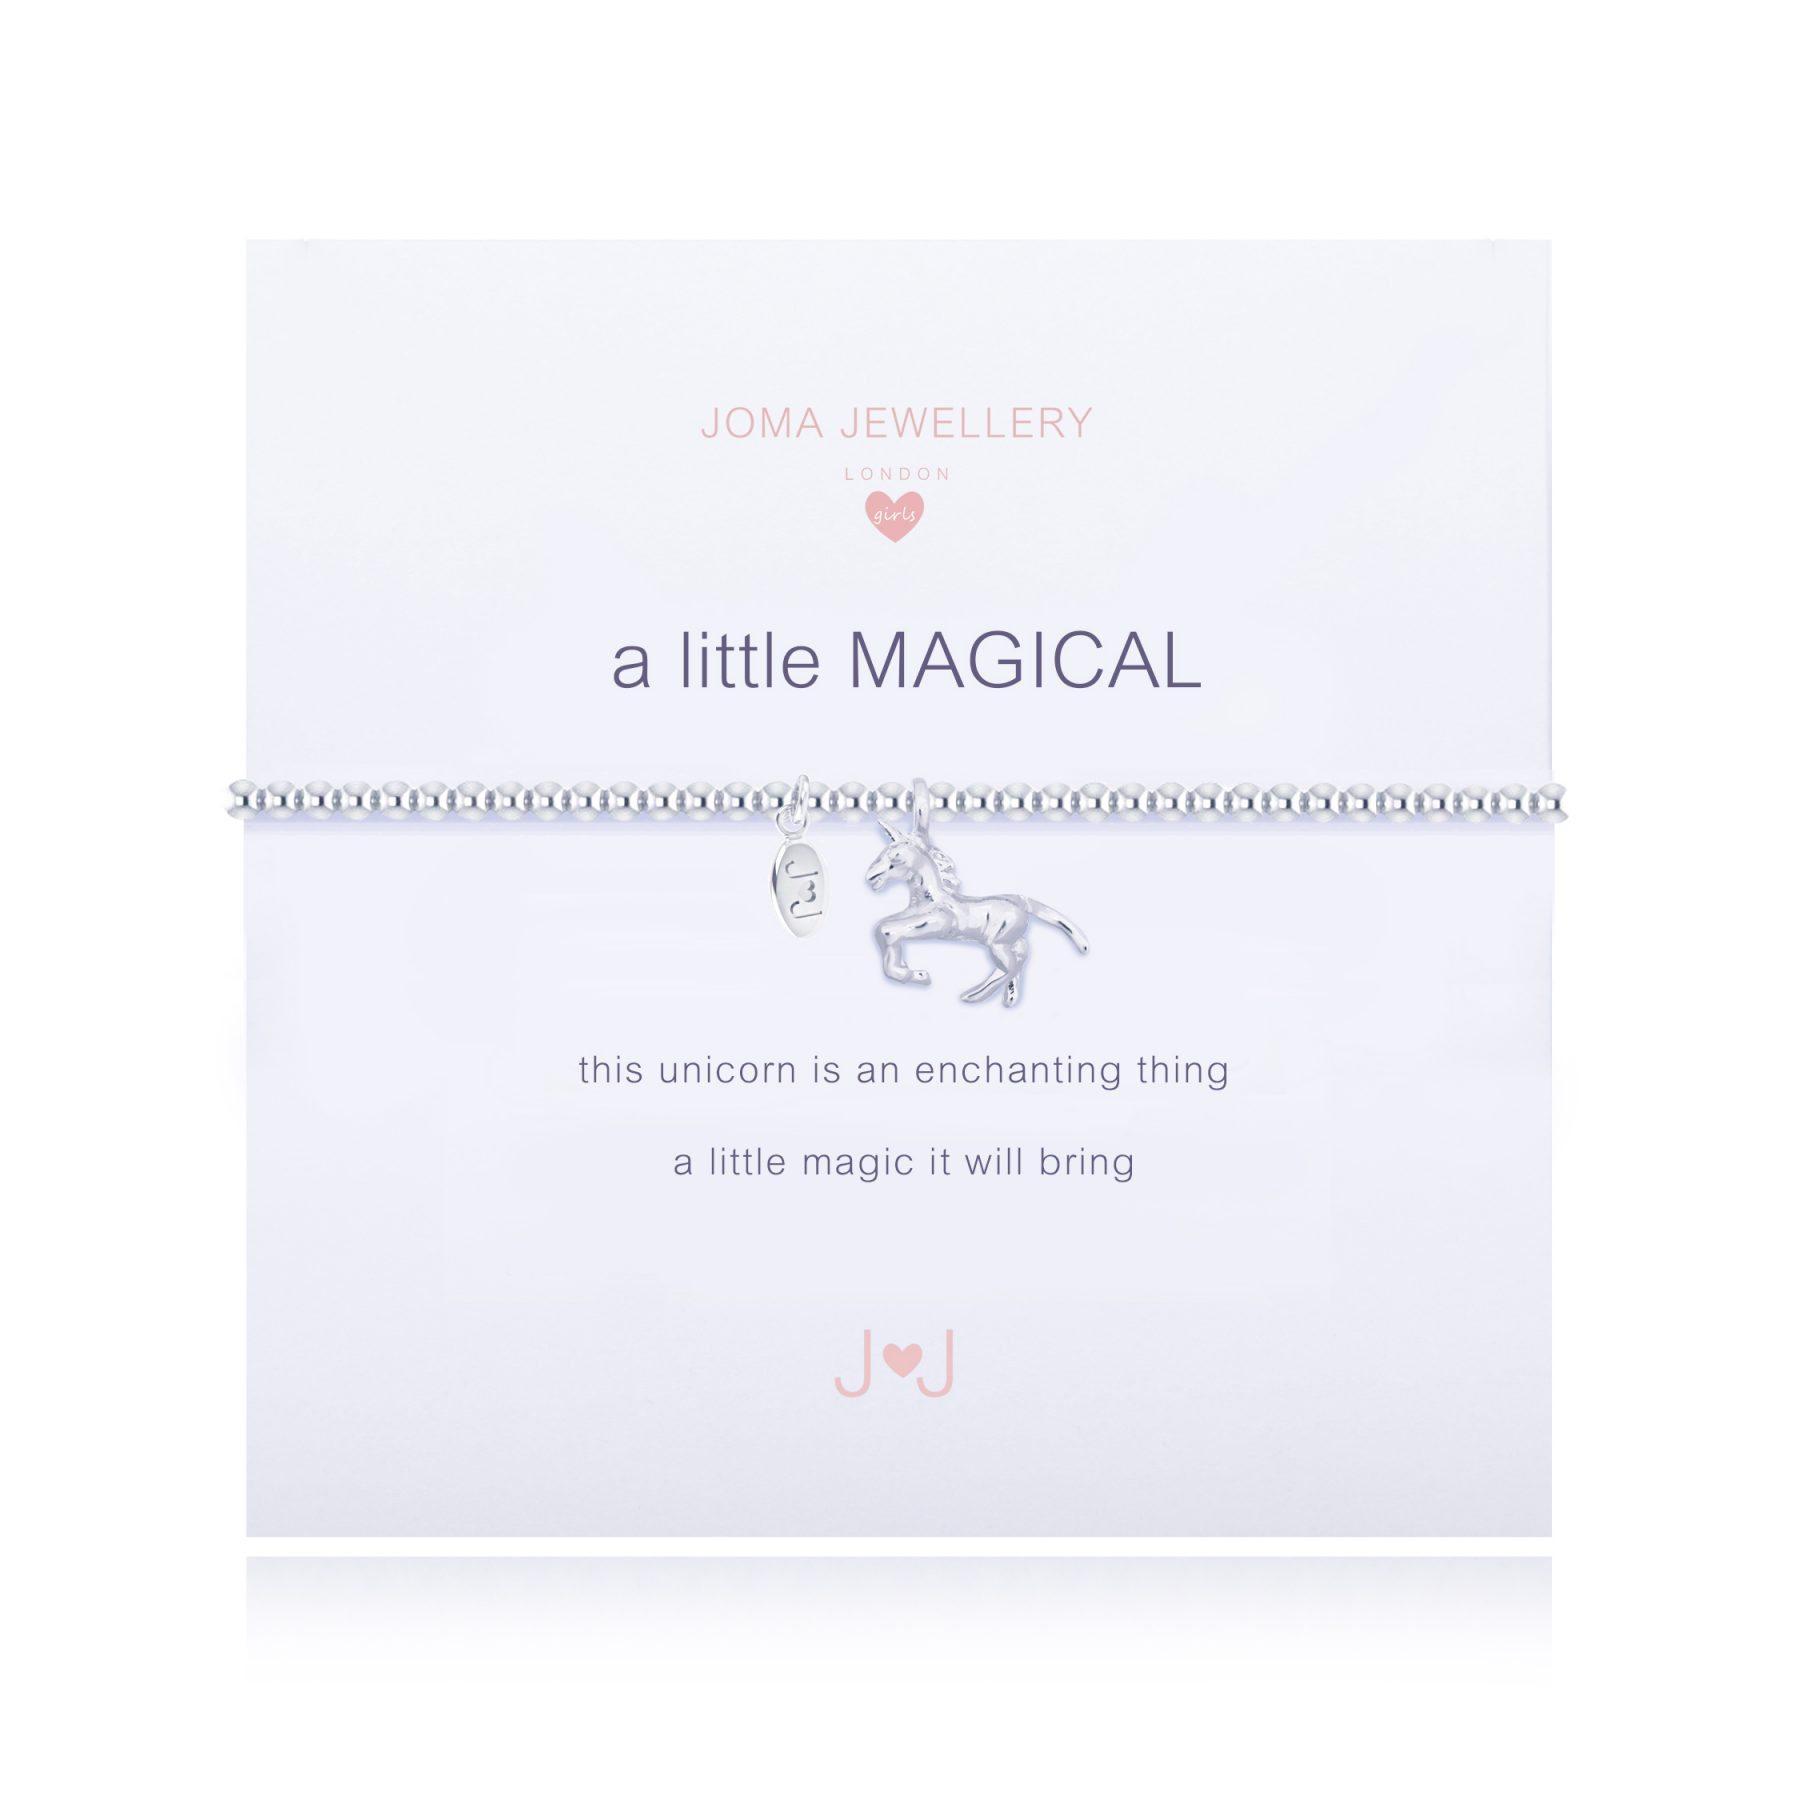 Joma Jewellery - A Little Magical - Childrens Bracelet vYW5uTEak